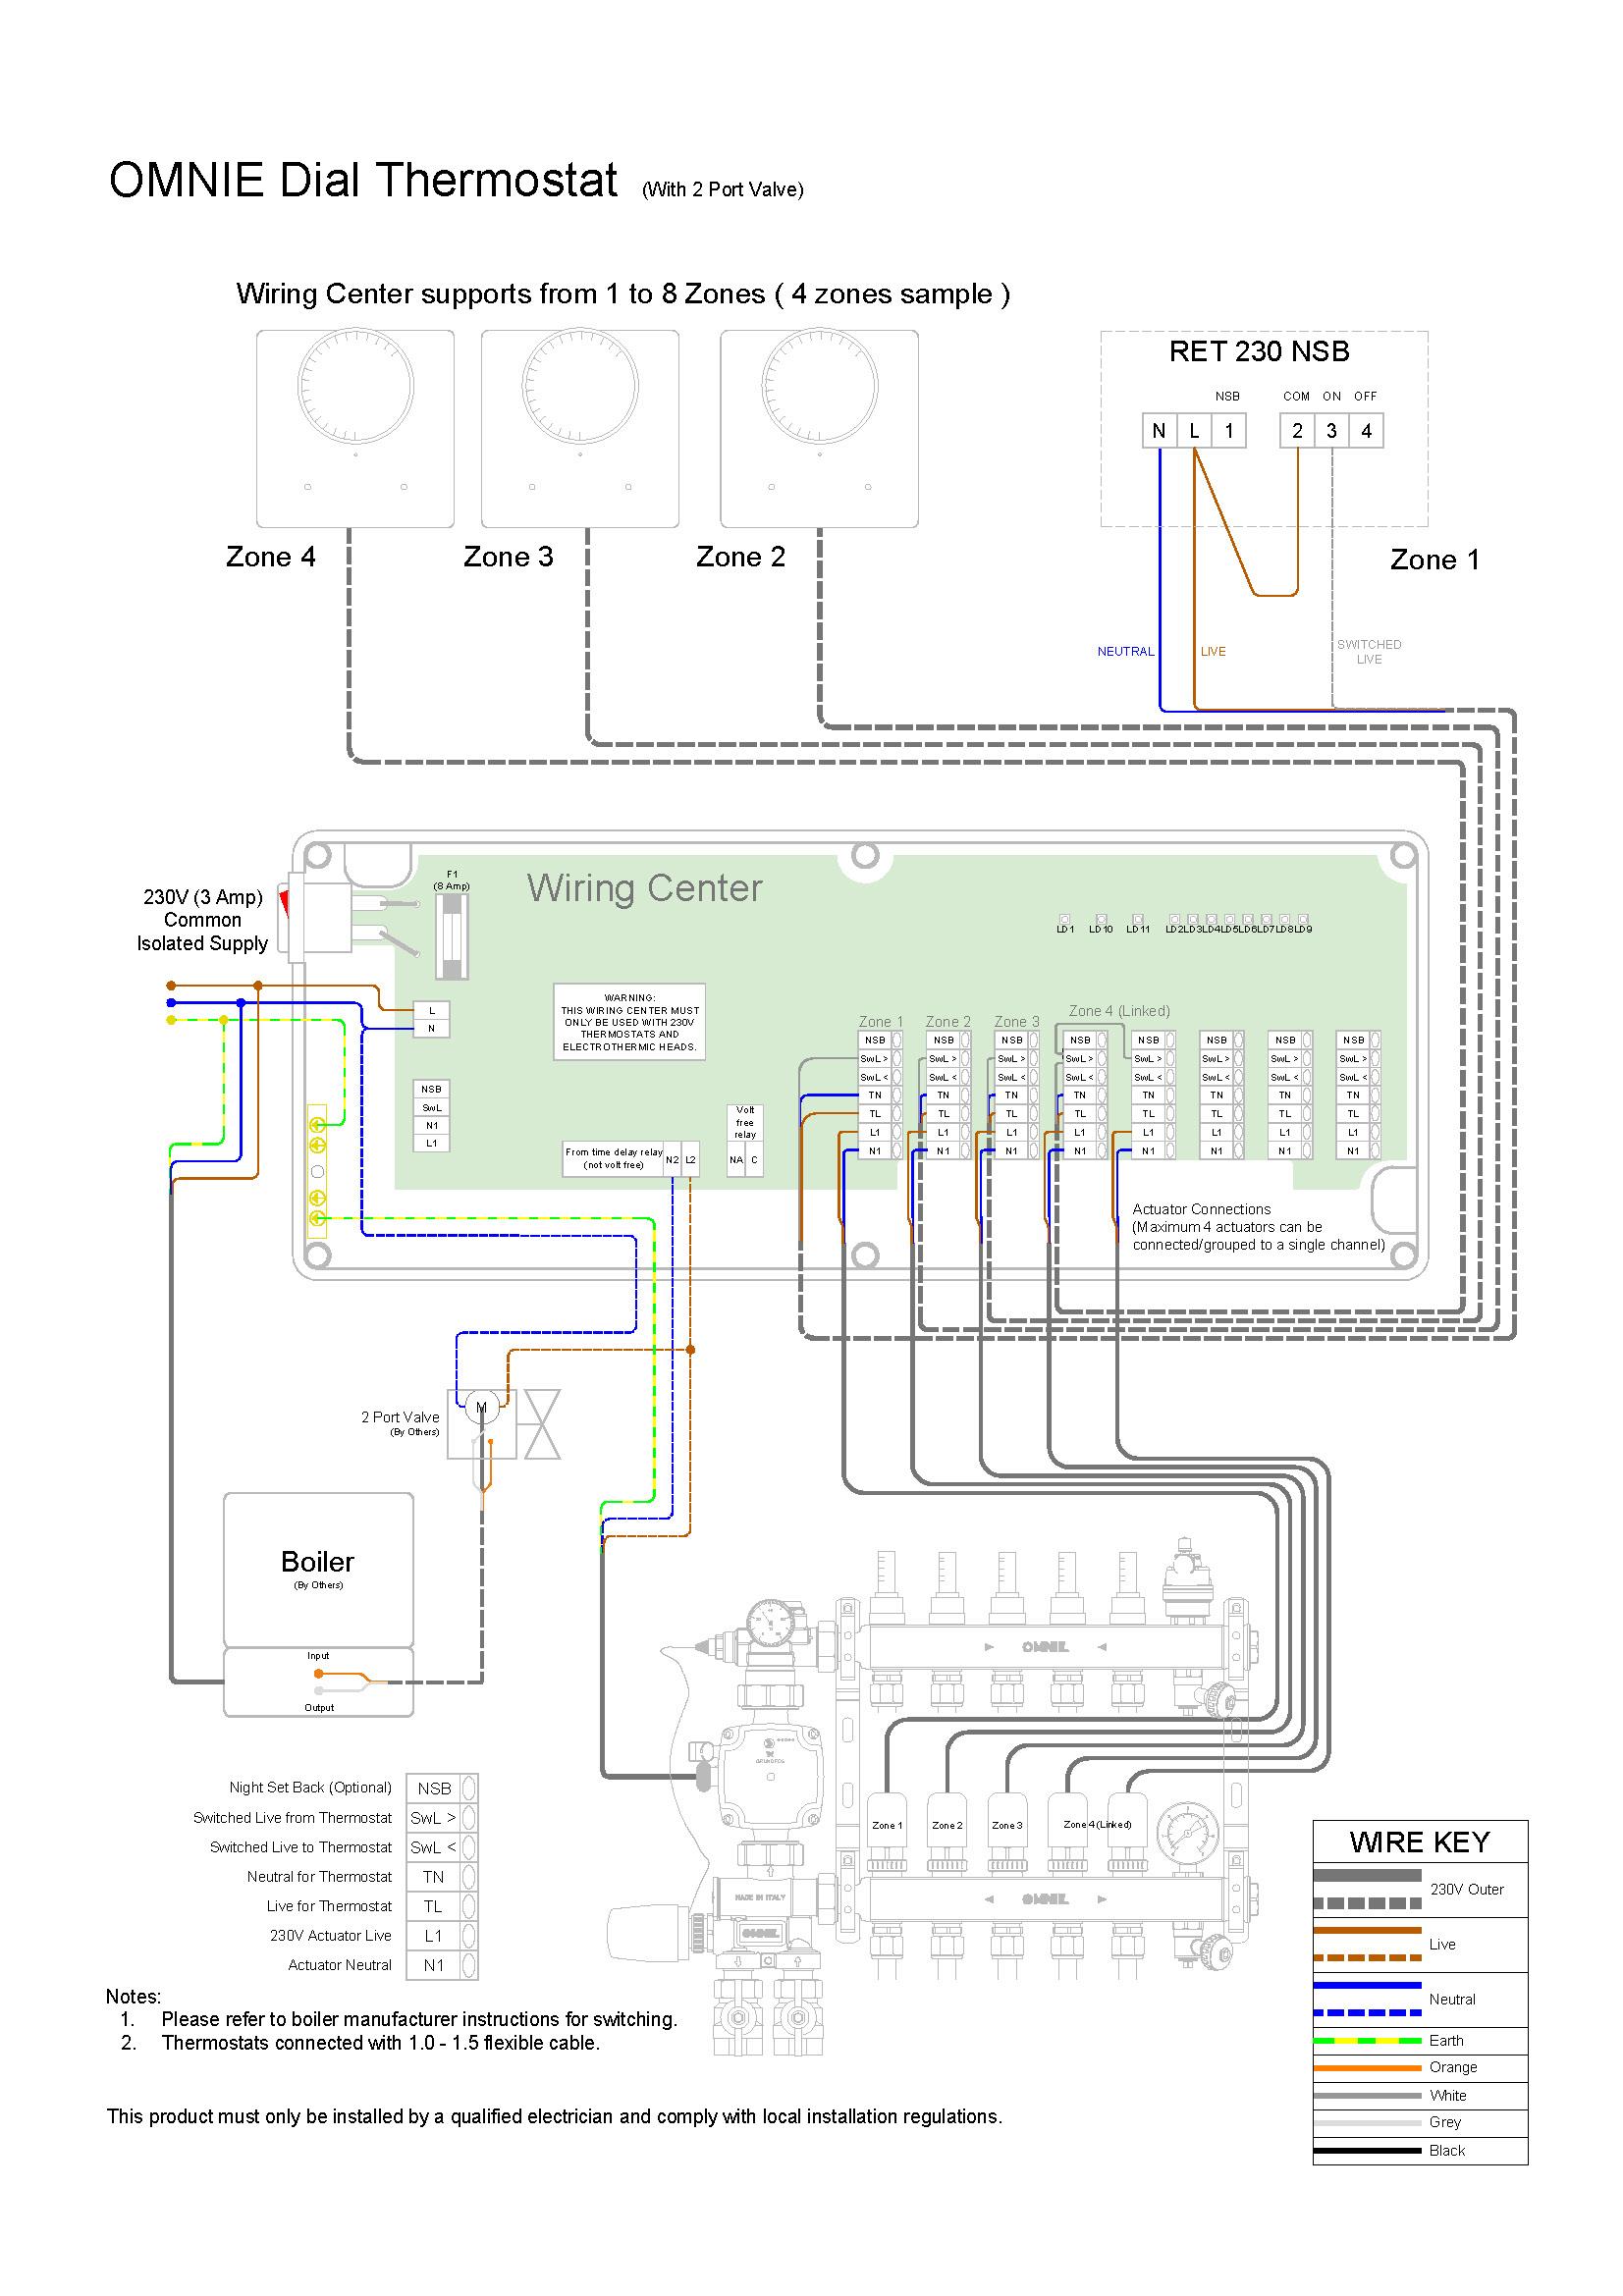 Nest Second Generation Wiring Diagram from cdn1.omnie.co.uk